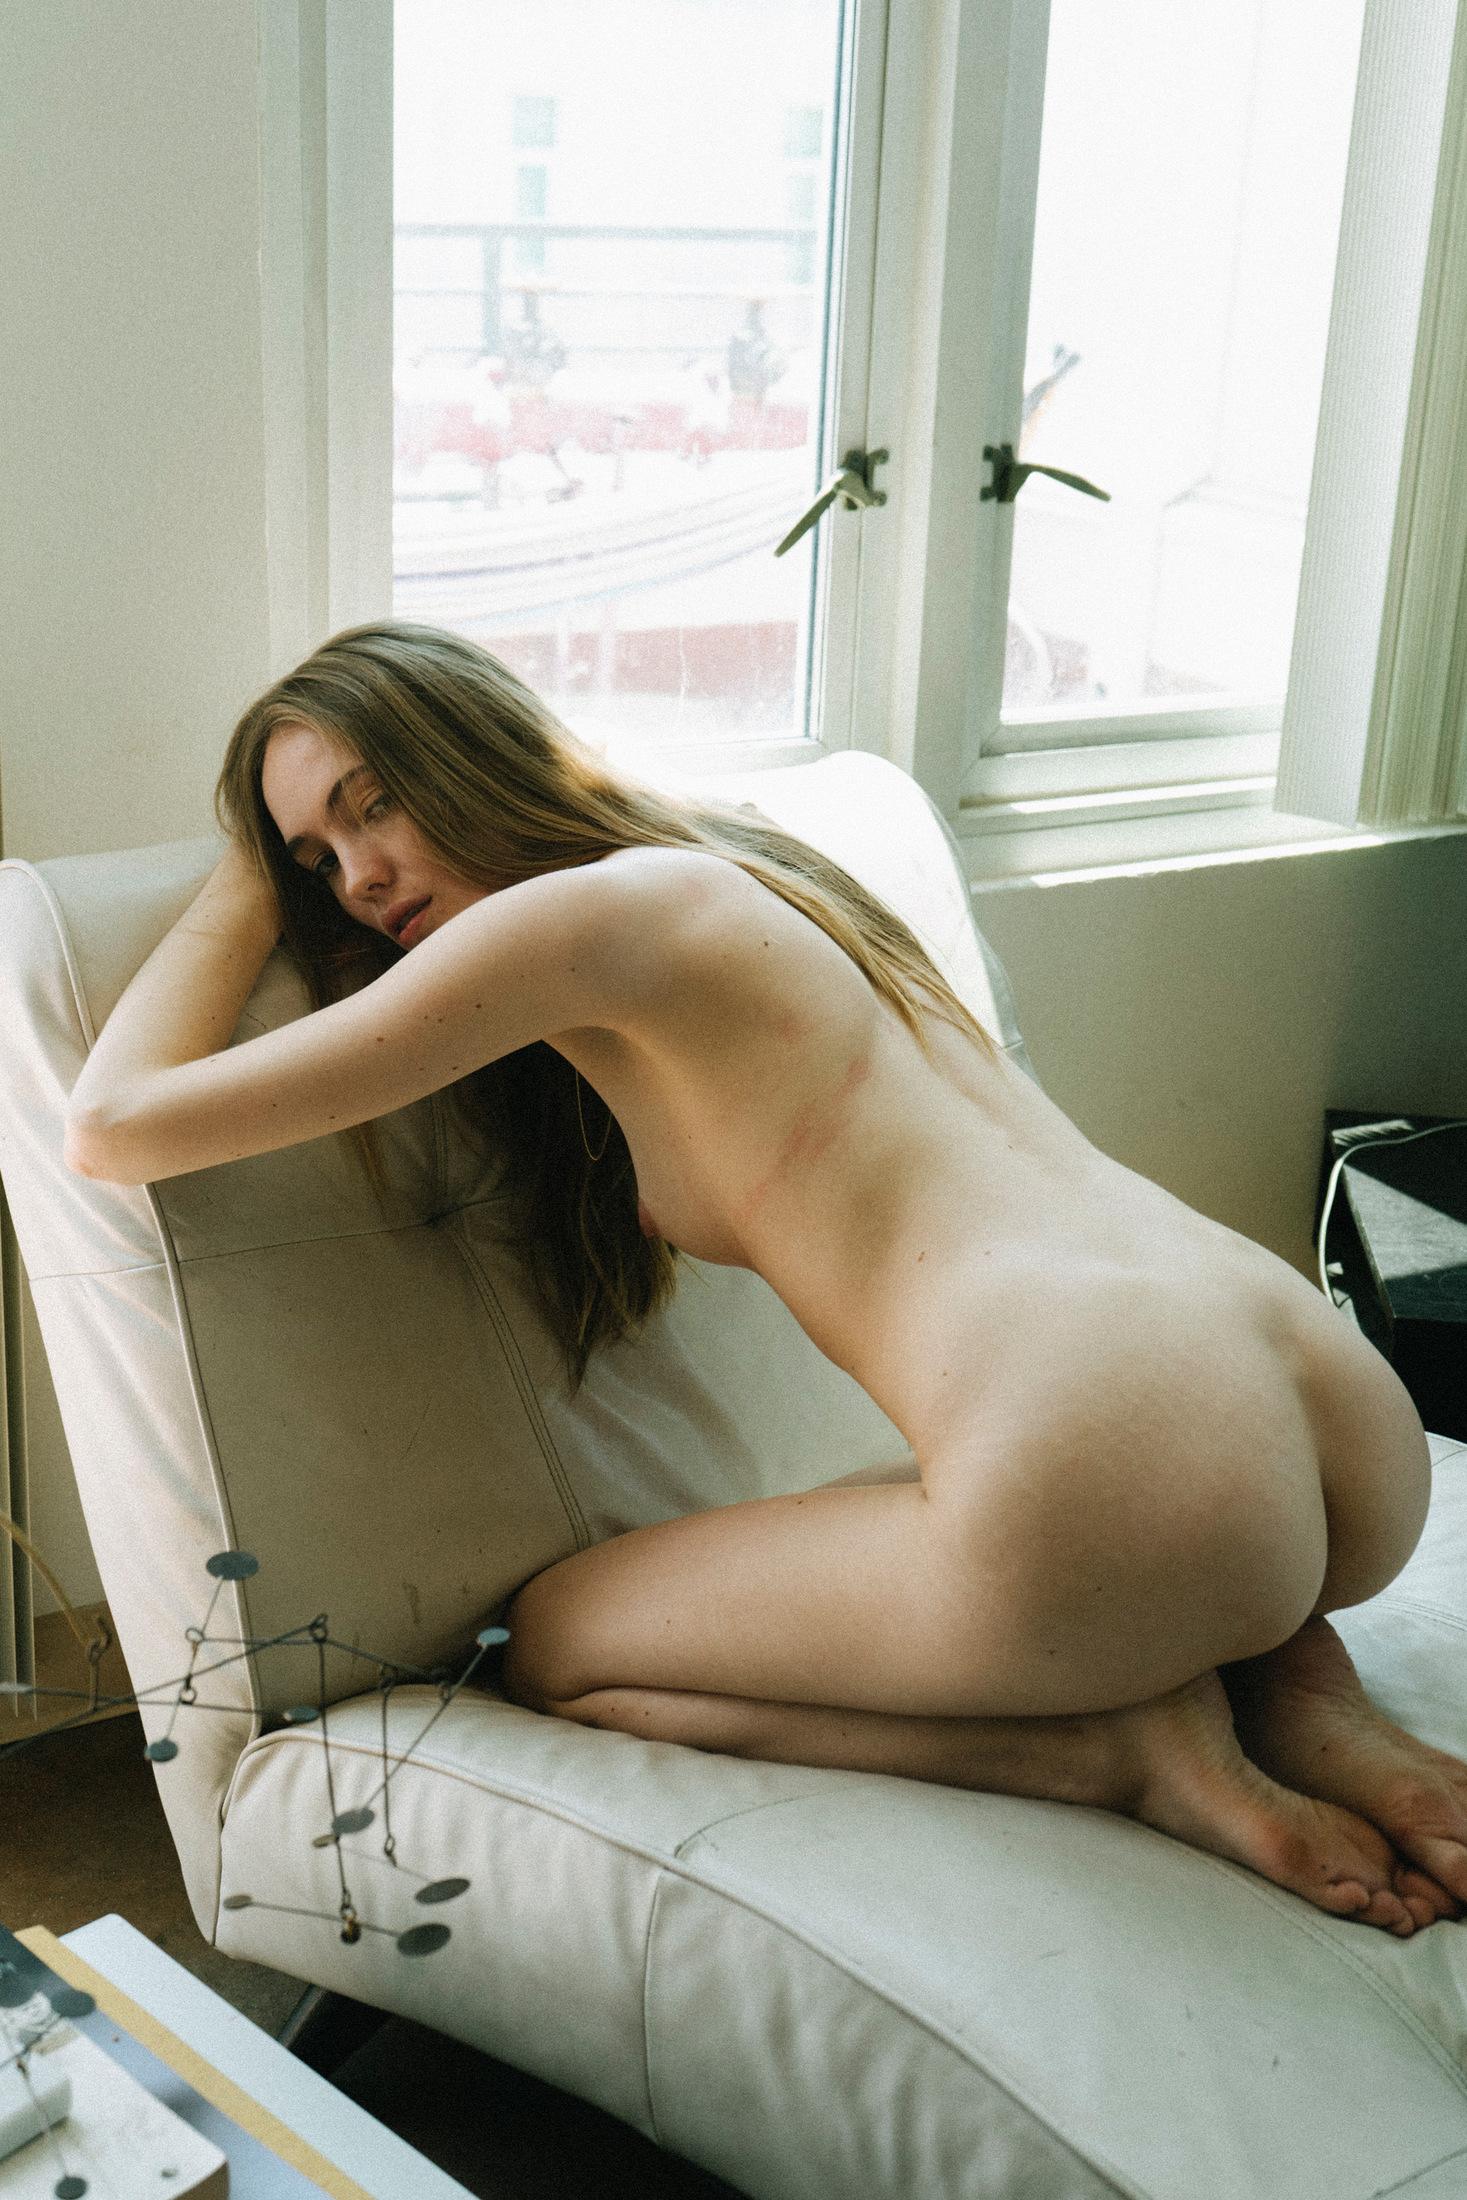 Ema McKie - Sam Livm photoshoot